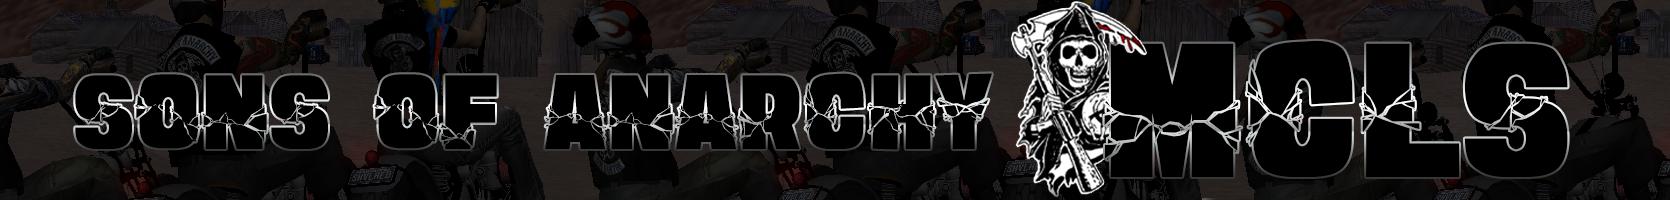 Banner moto clube sa-mp 53krpj11